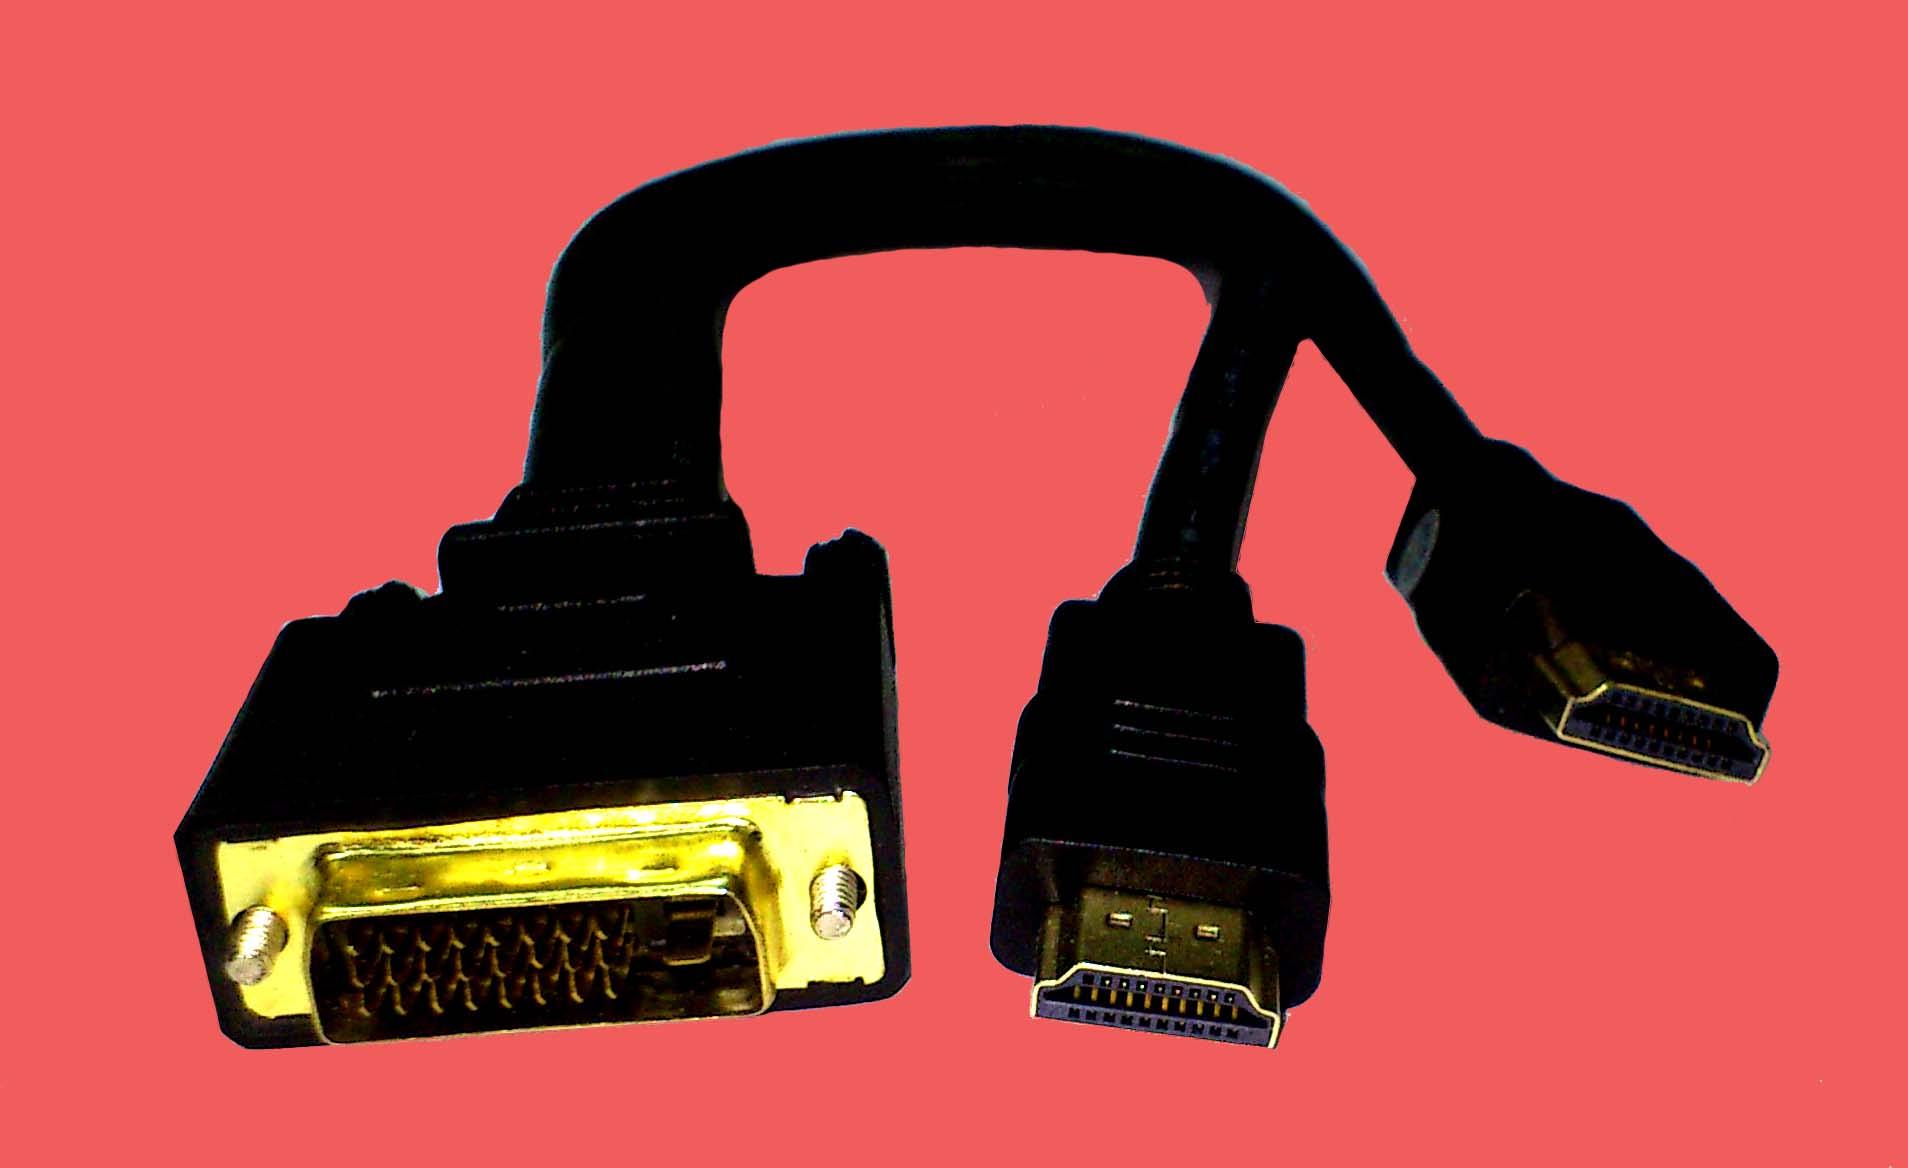 Передача Сигналов по Витой Паре (HDMI, DVI, VGA, USB) 16